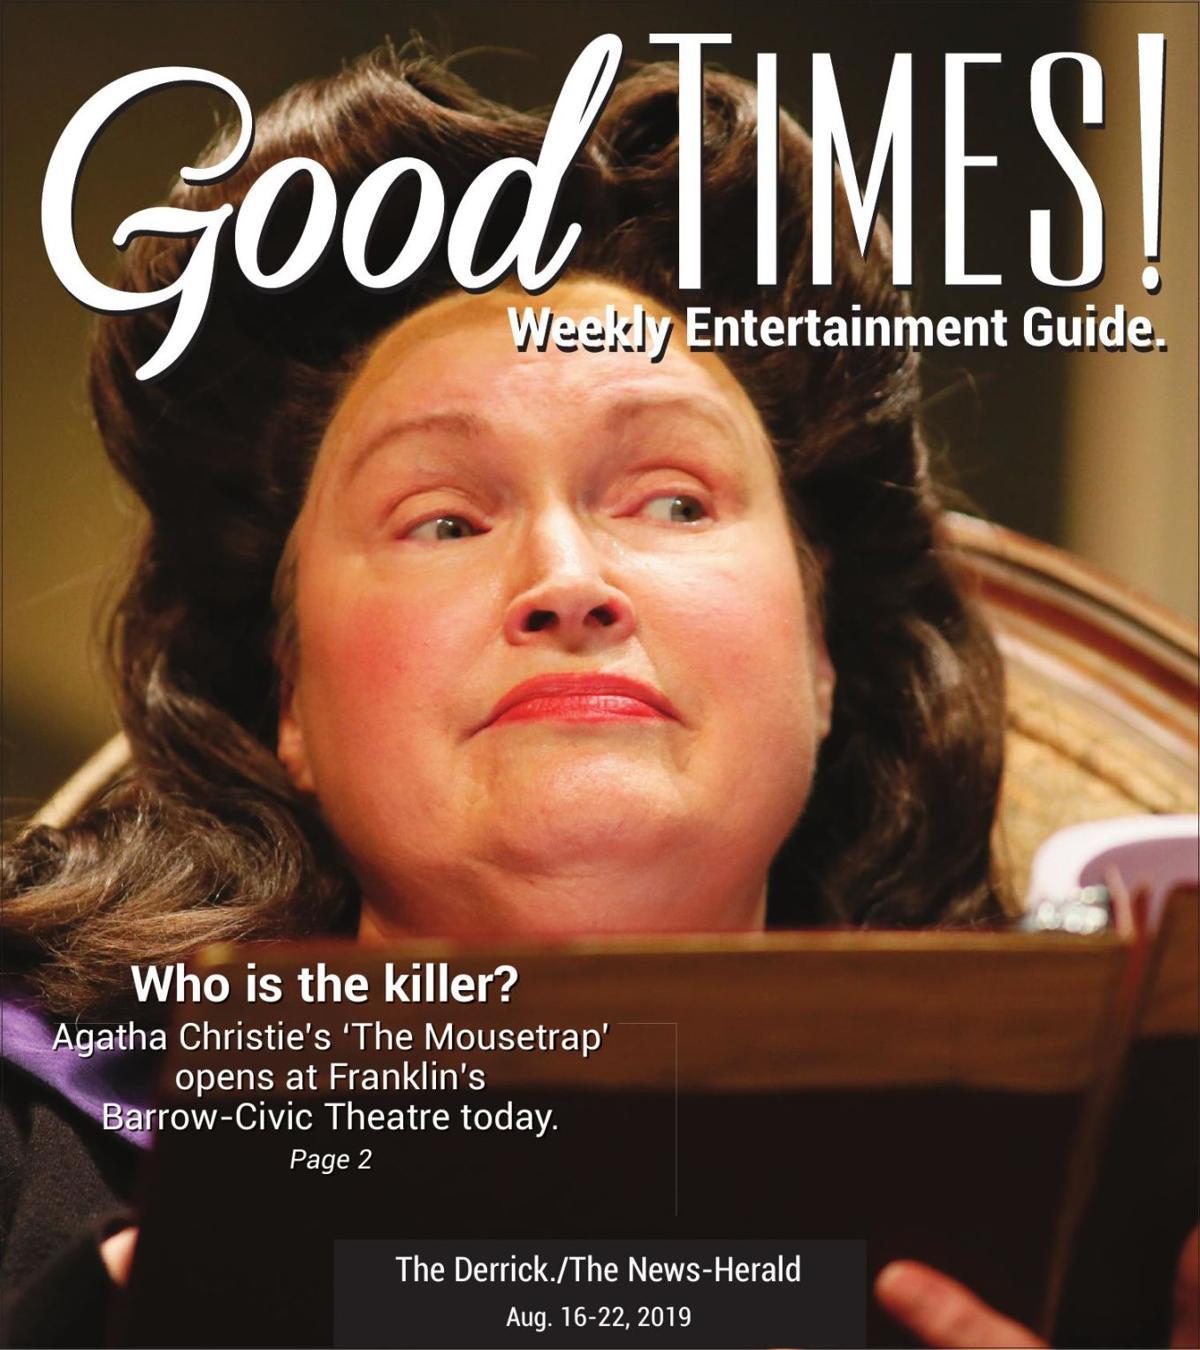 Good Times 8-16-19